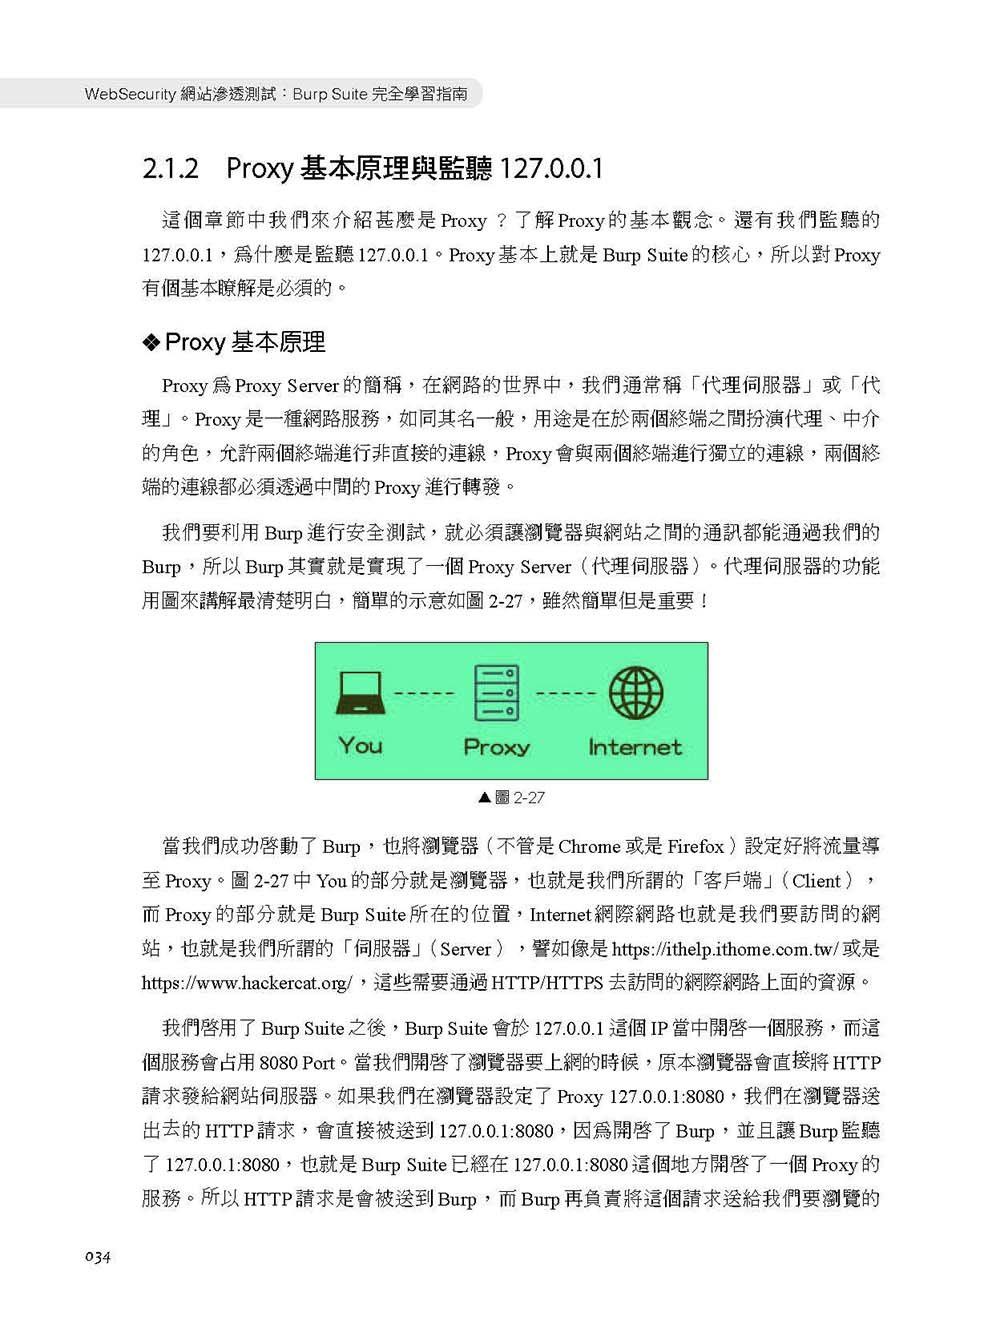 WebSecurity 網站滲透測試:Burp Suite 完全學習指南 (iT邦幫忙鐵人賽系列書)-preview-4